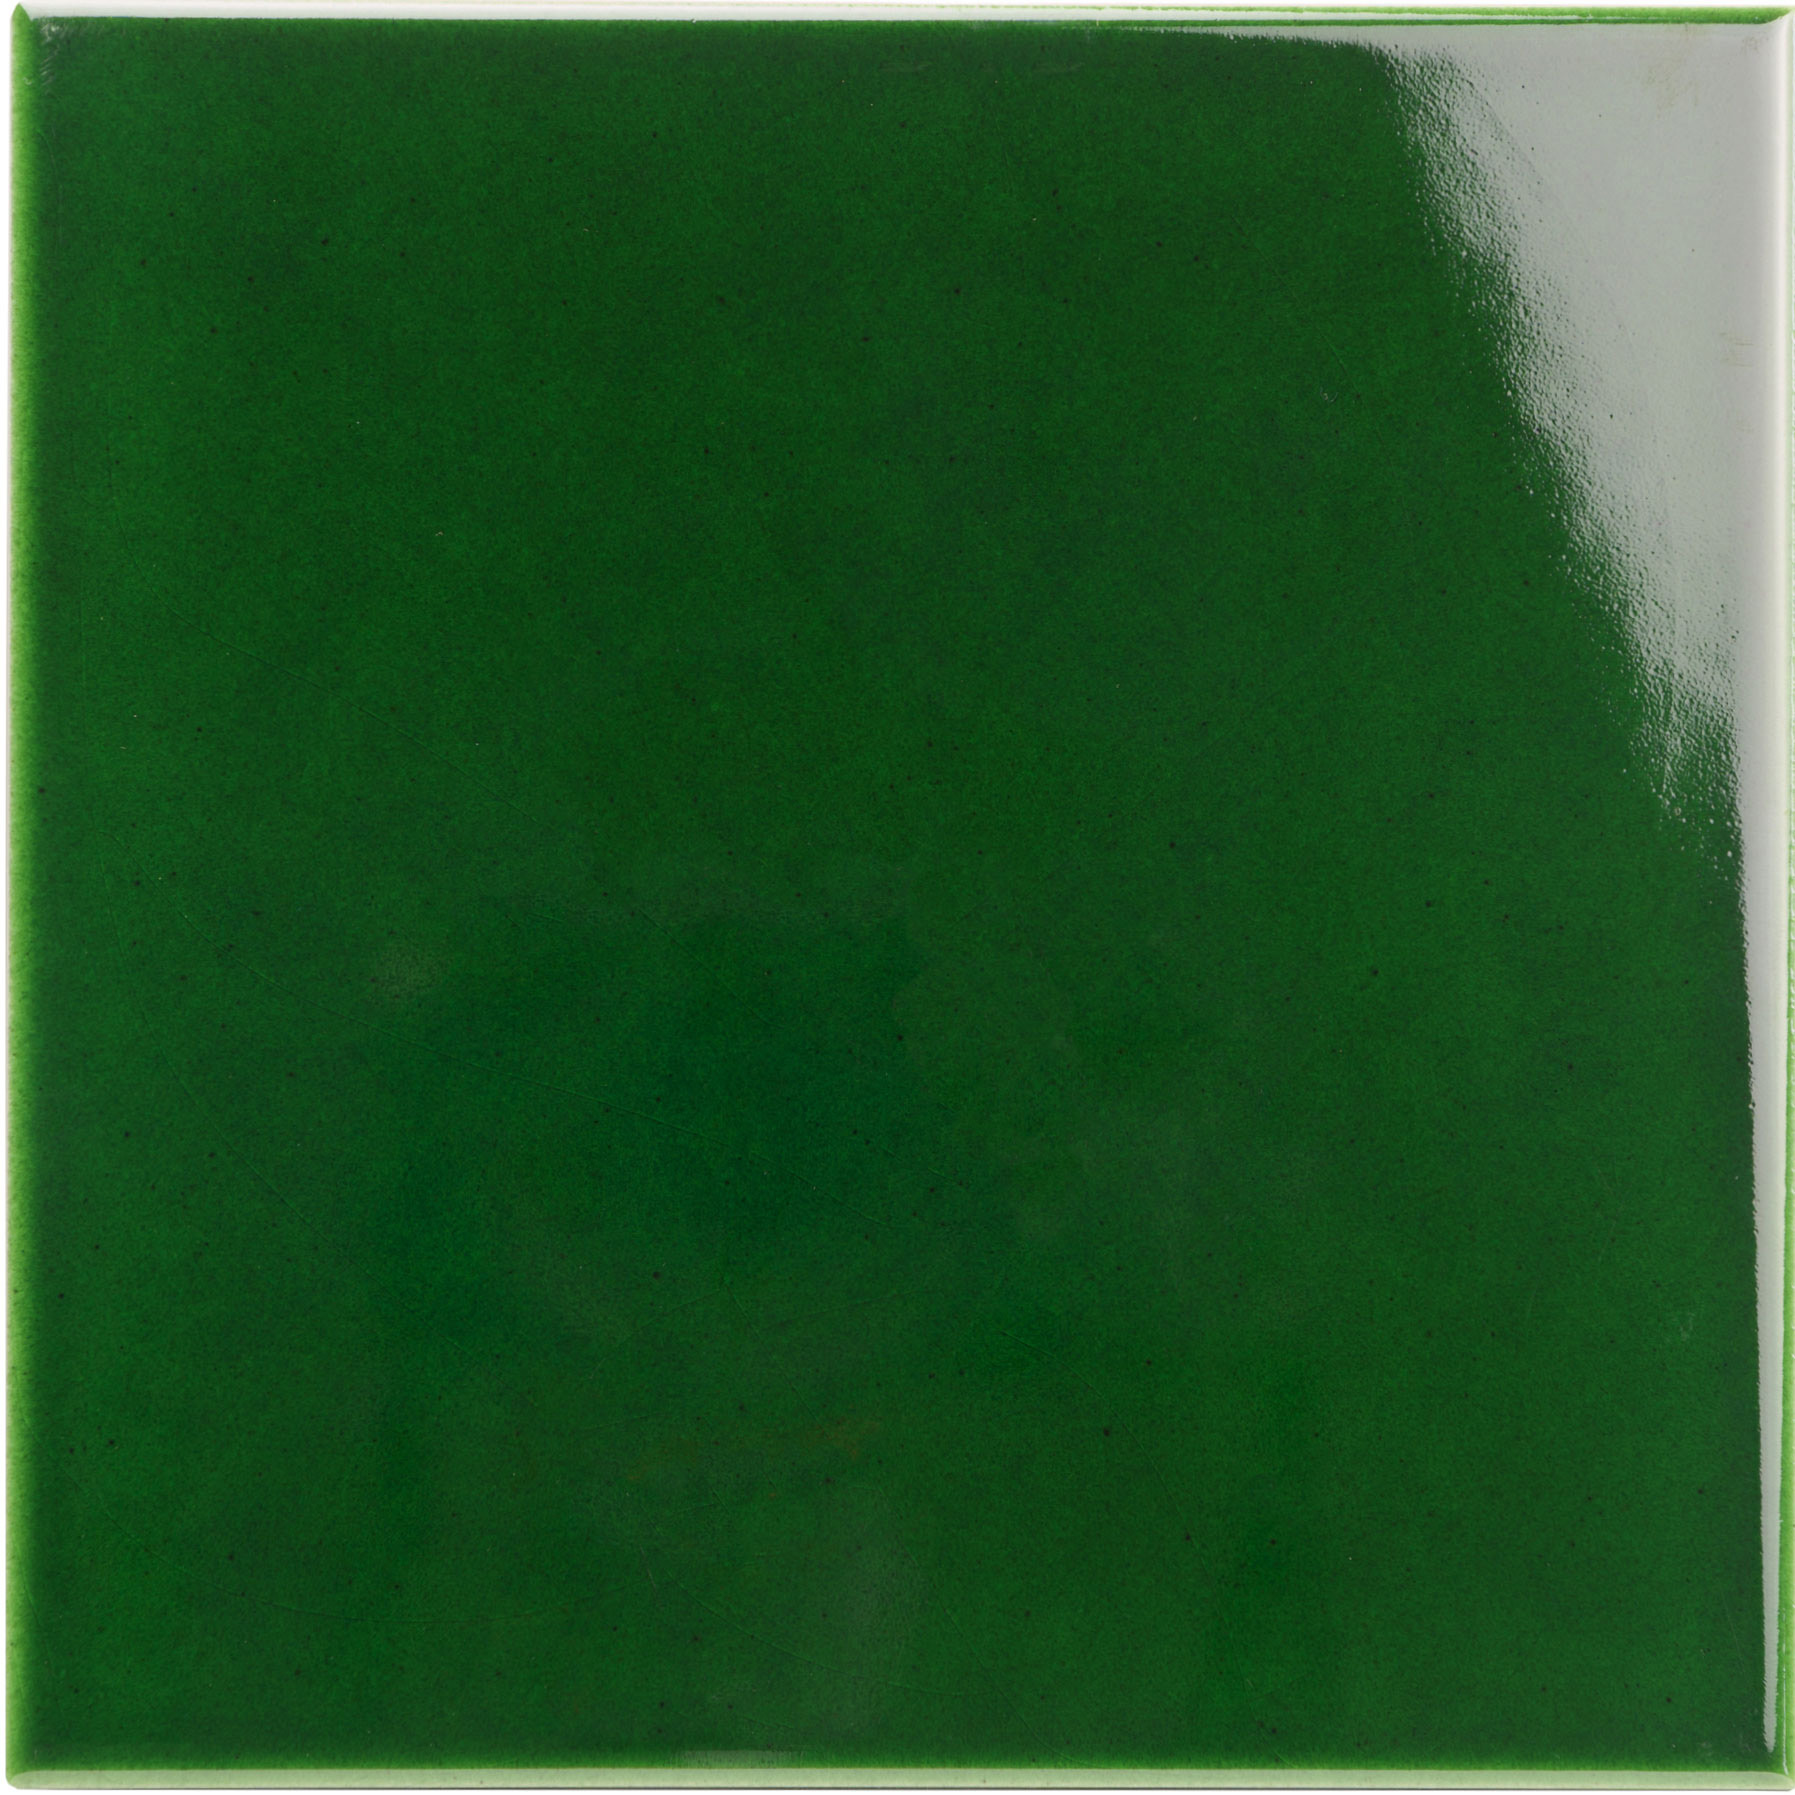 Edwardian Green - grönt kakel